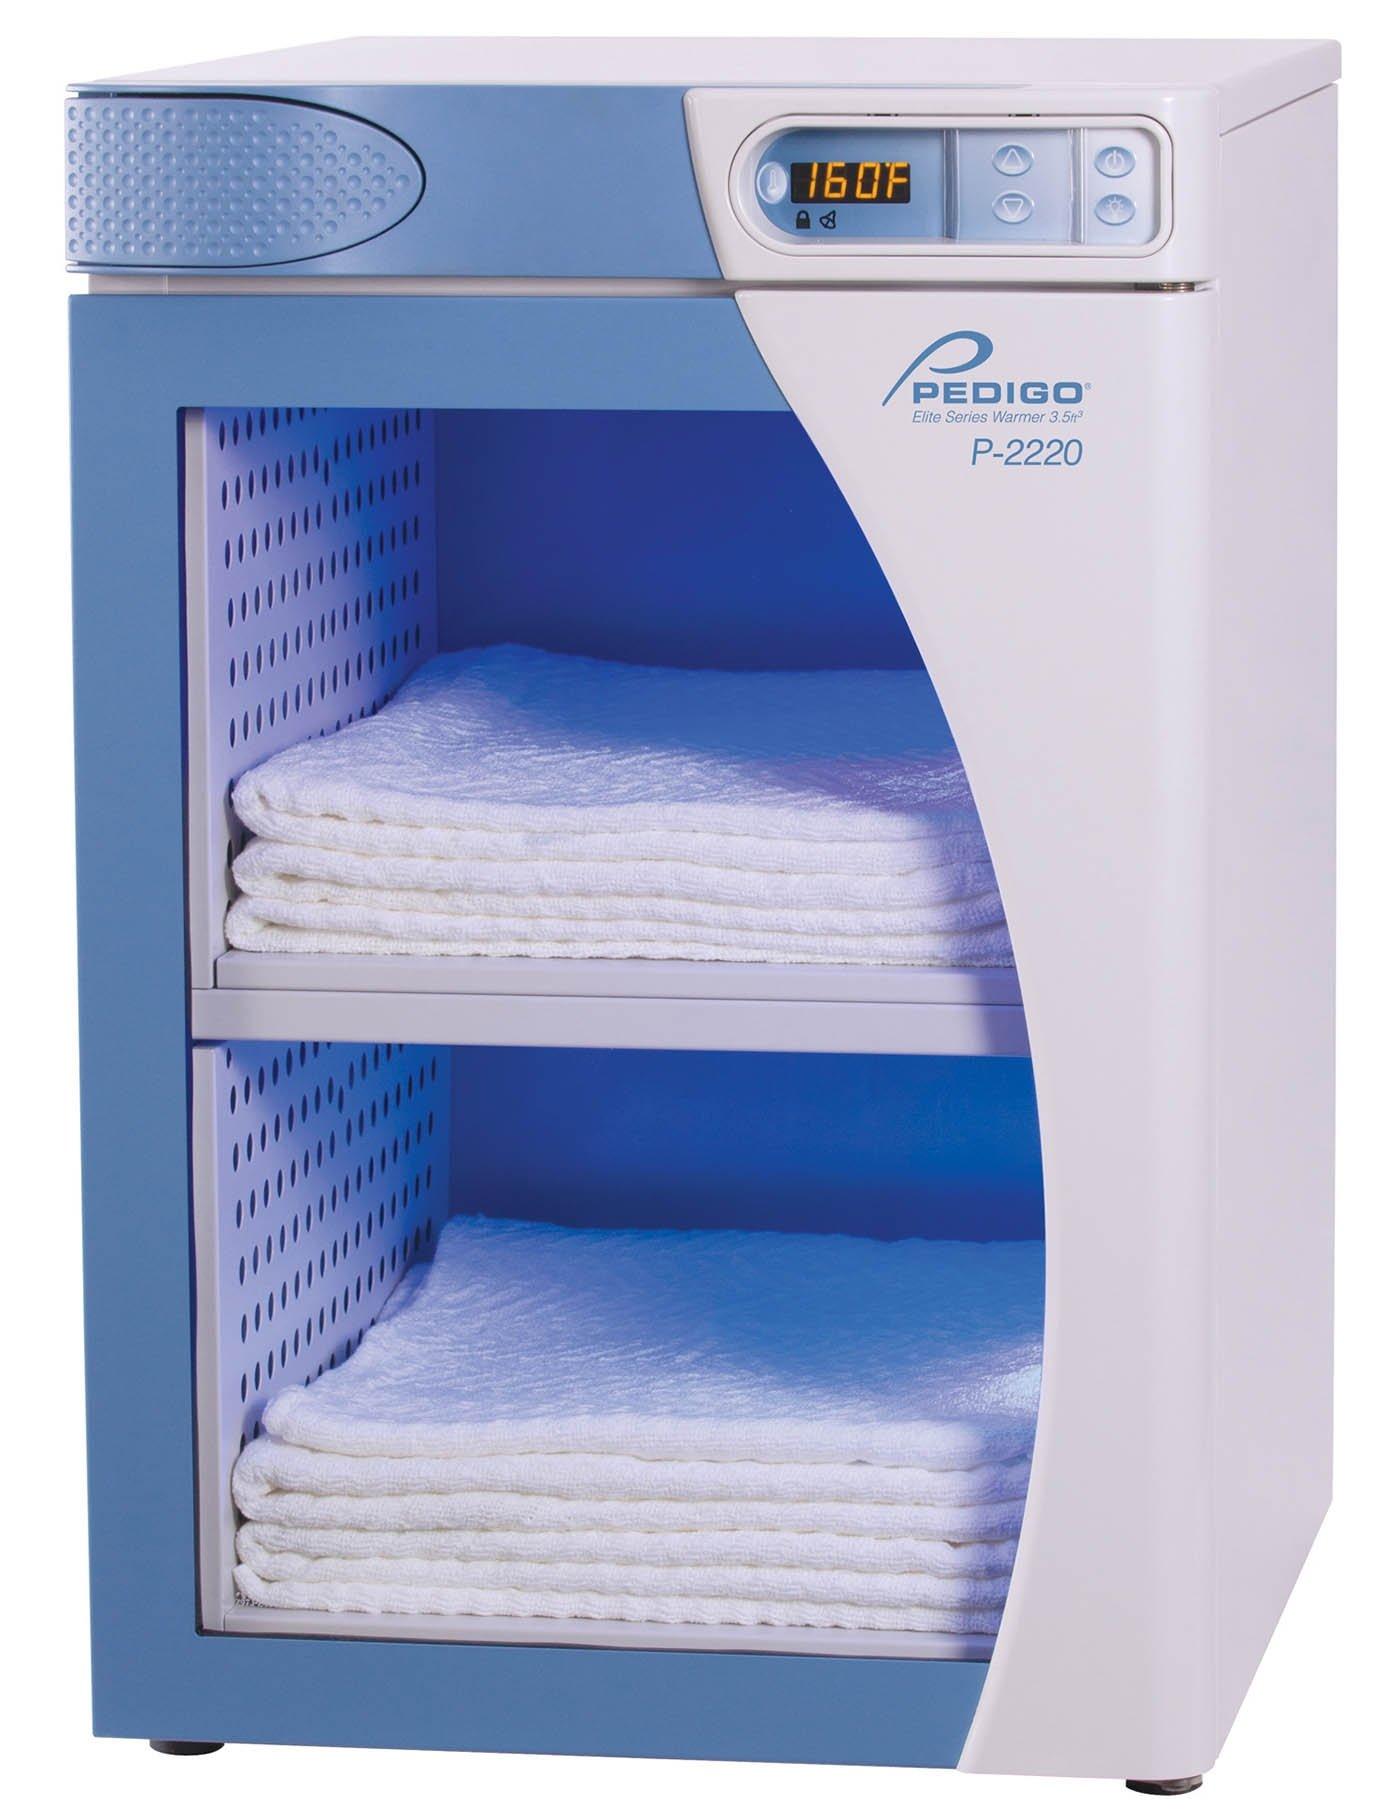 Pedigo Elite Series Warming Cabinet, 3.5 Cubic Feet Compartment, Glass Window Door